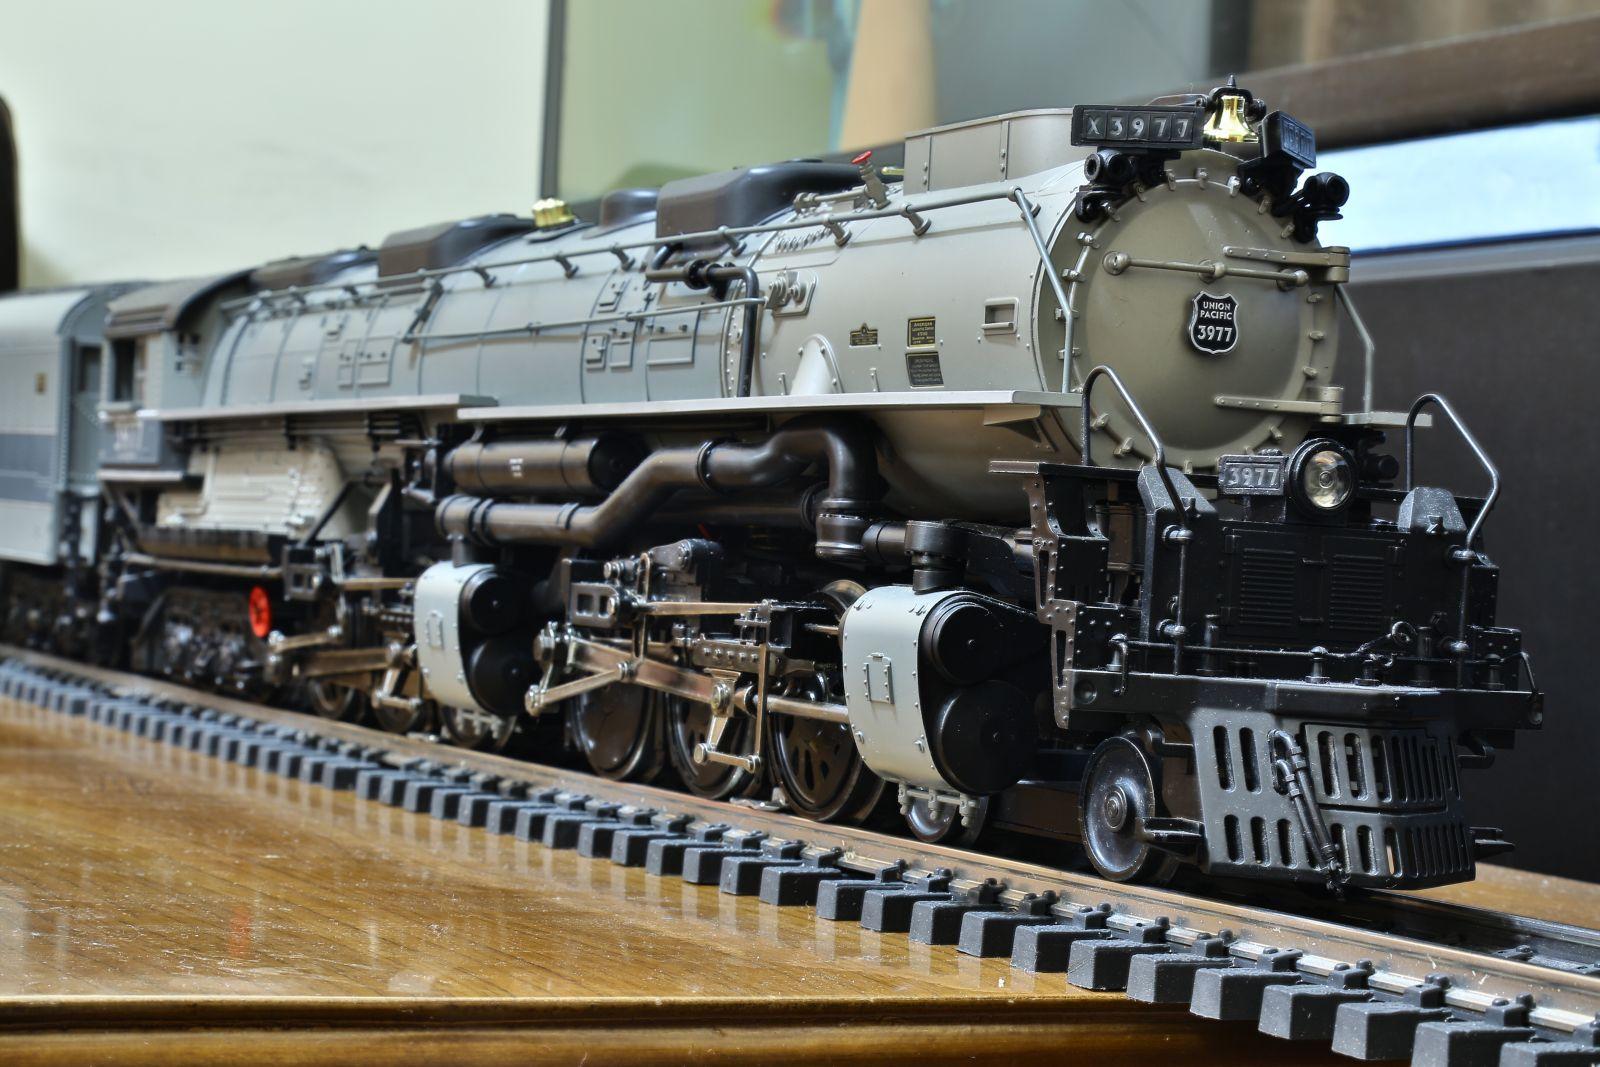 MTH Challenger 3977